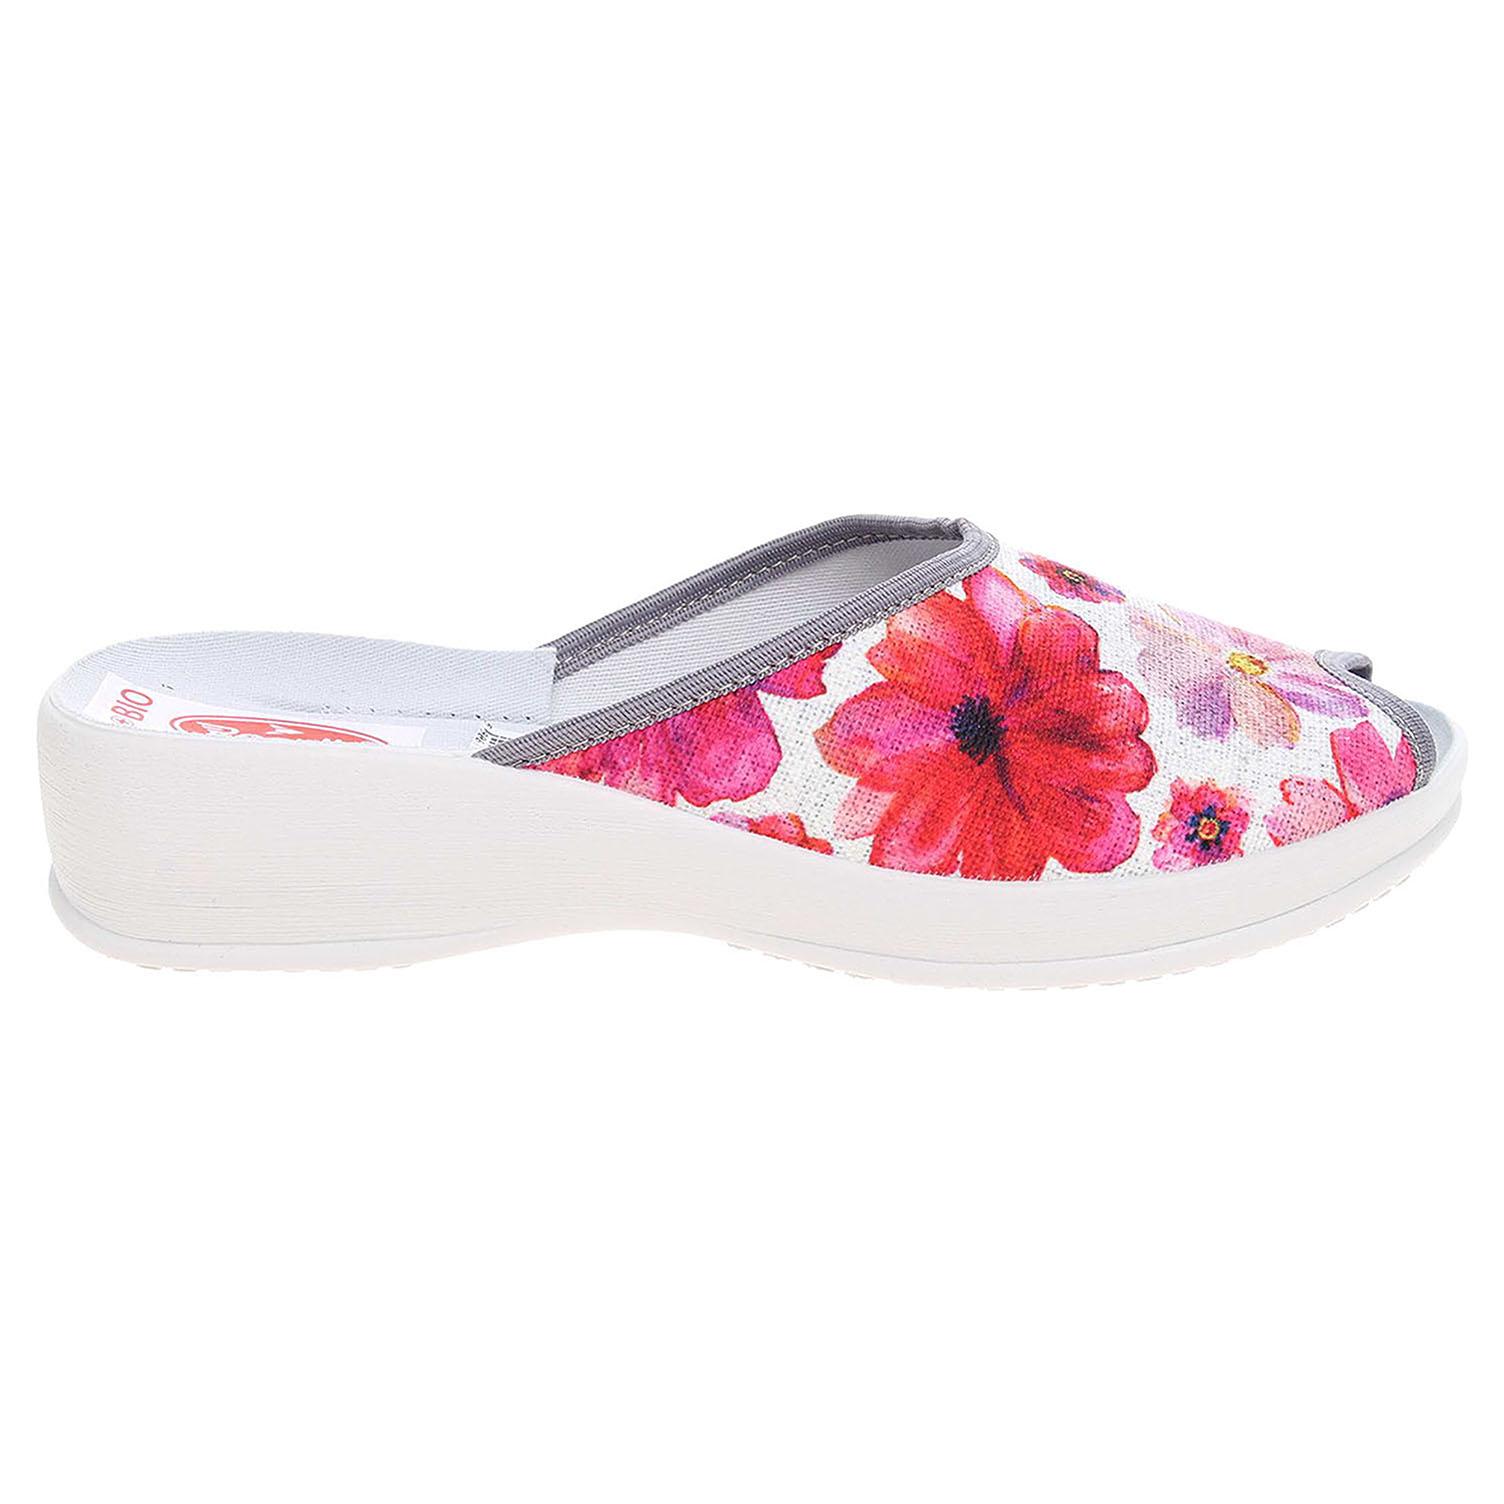 Ecco Rogallo domácí pantofle 21563 růžové 23500496